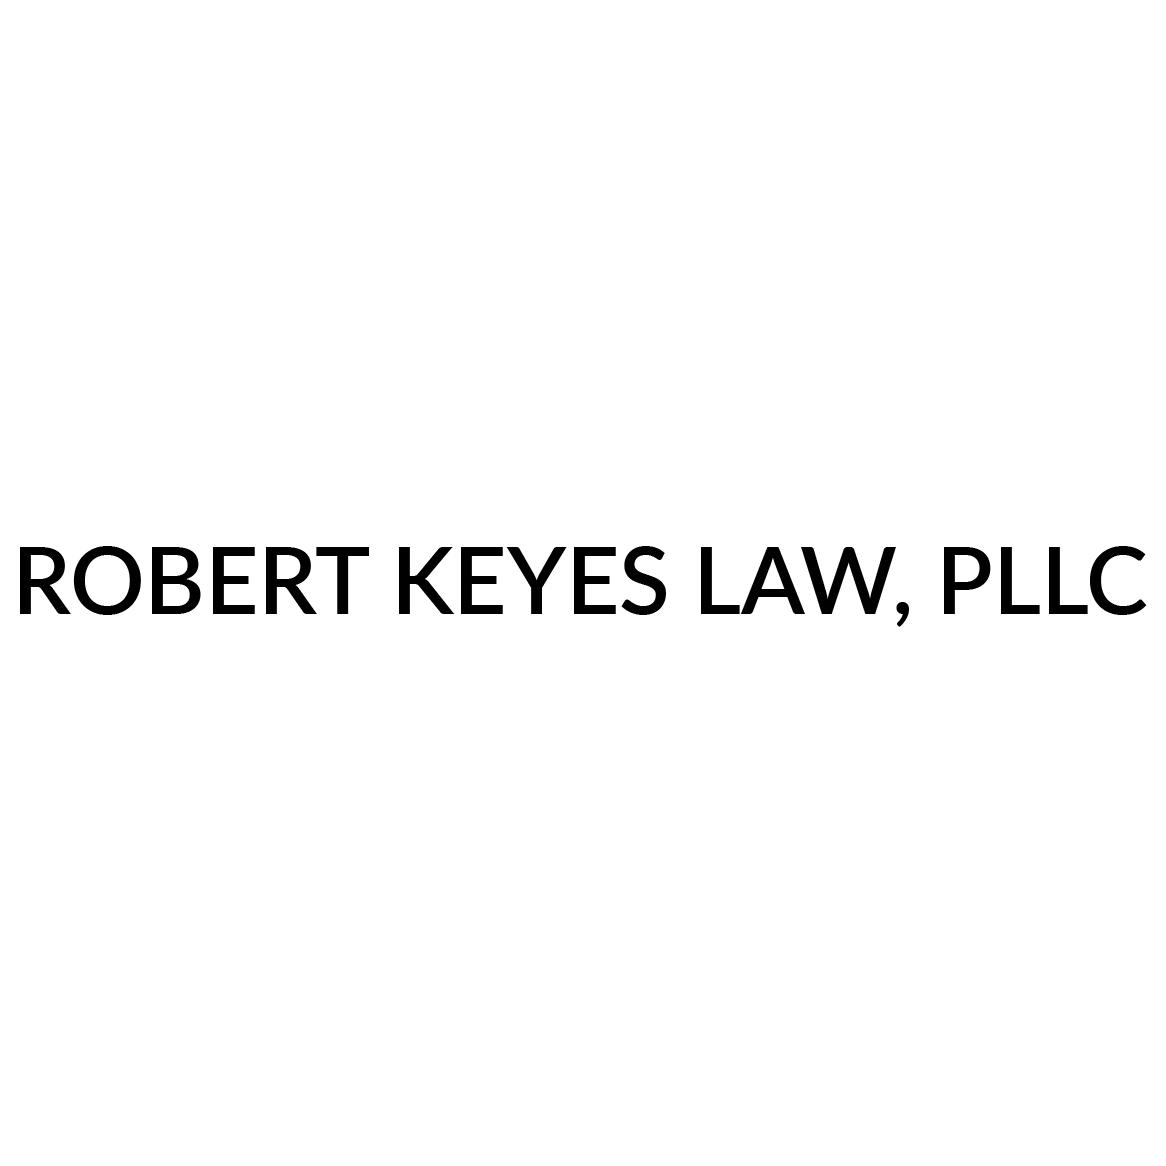 Robert Keyes Law, PLLC